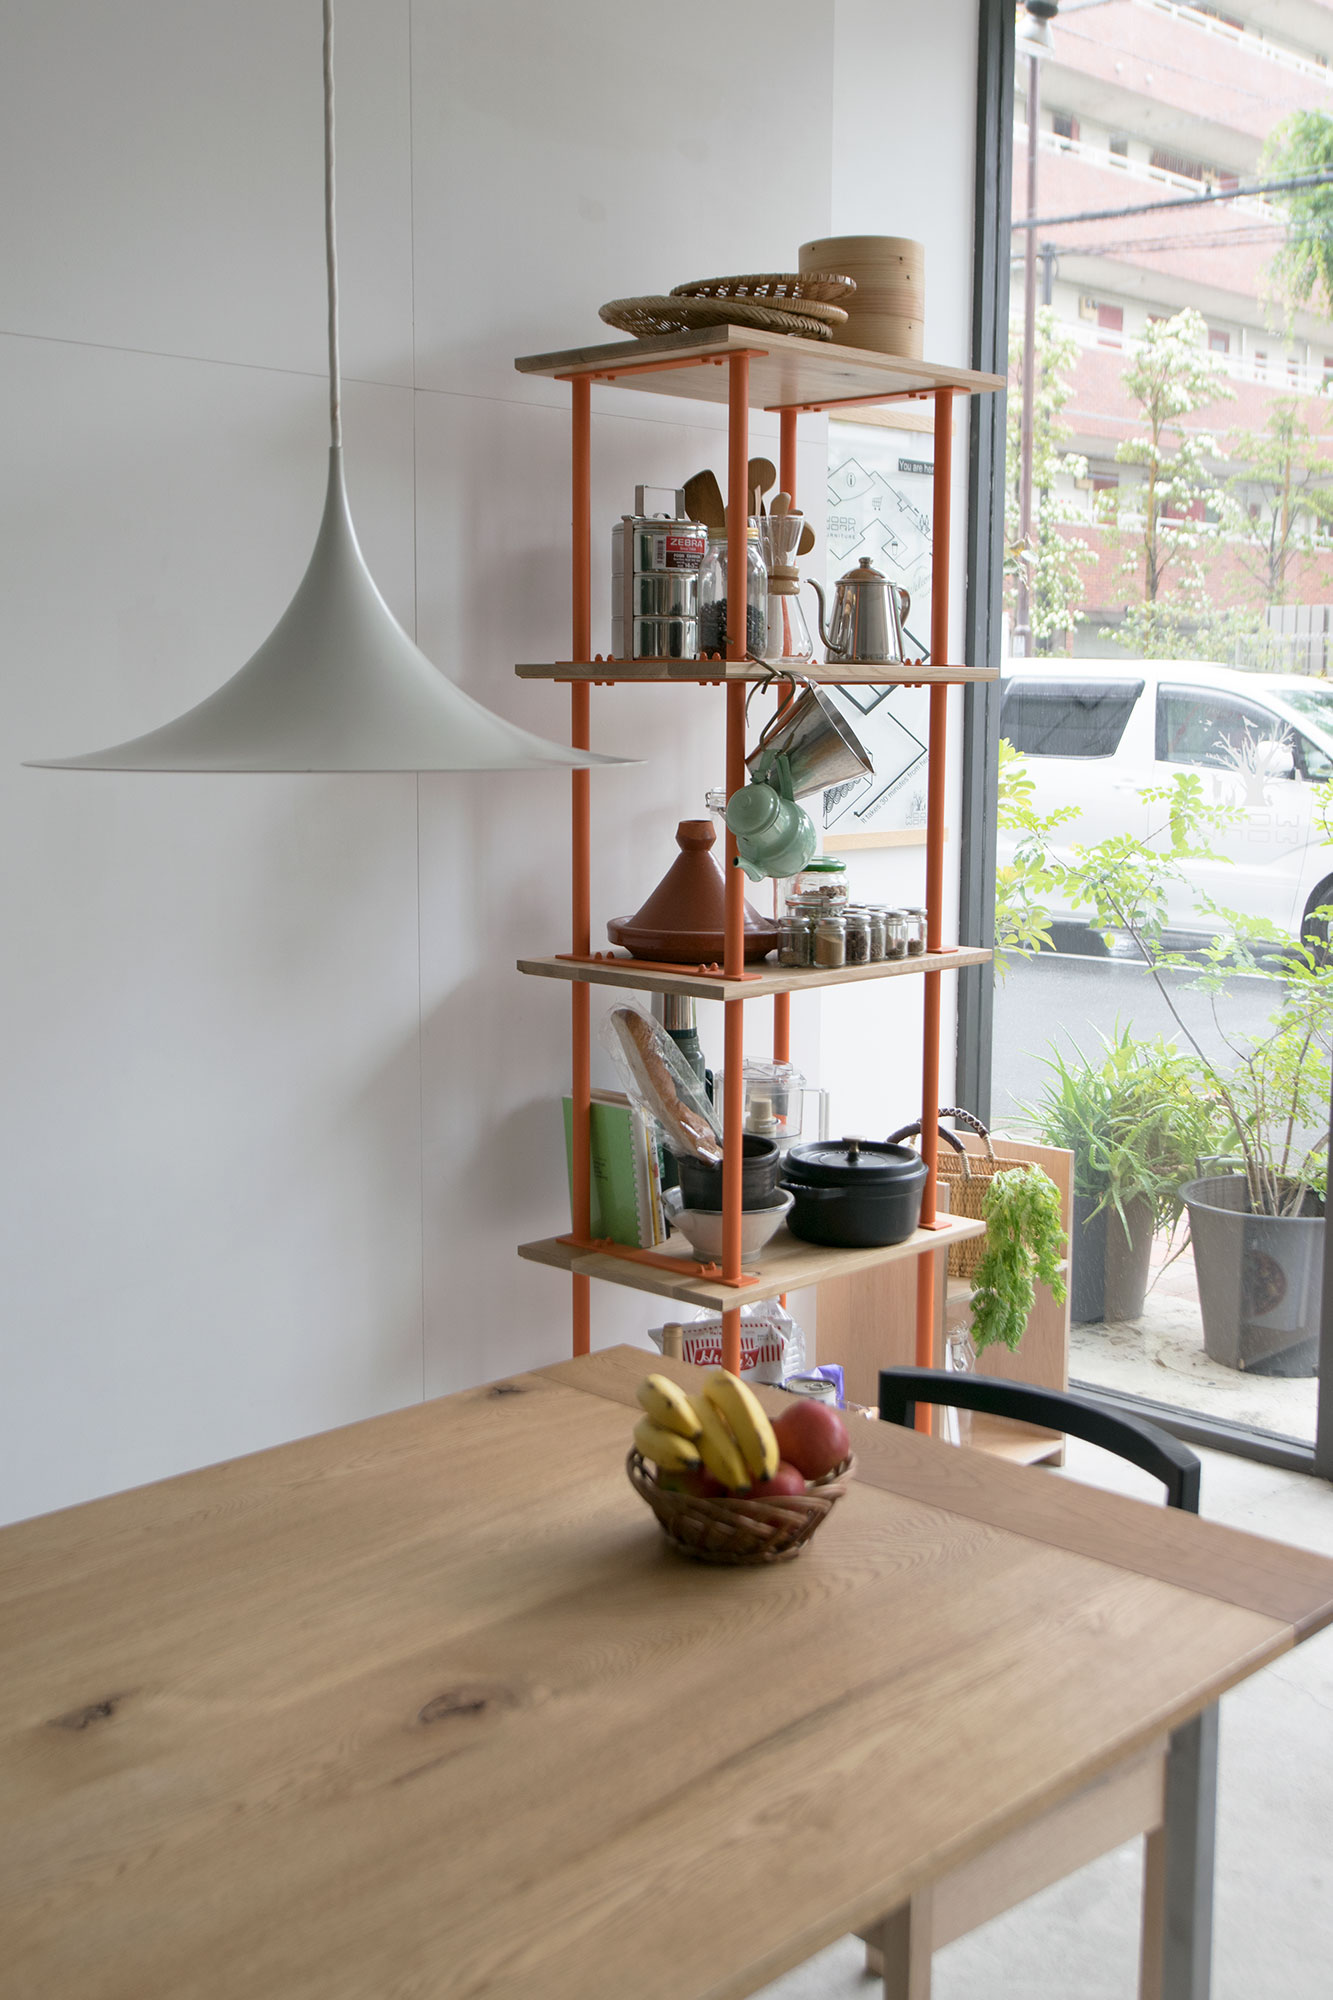 【BUILD RACK】特別なひと棚 -キッチン収納棚編-